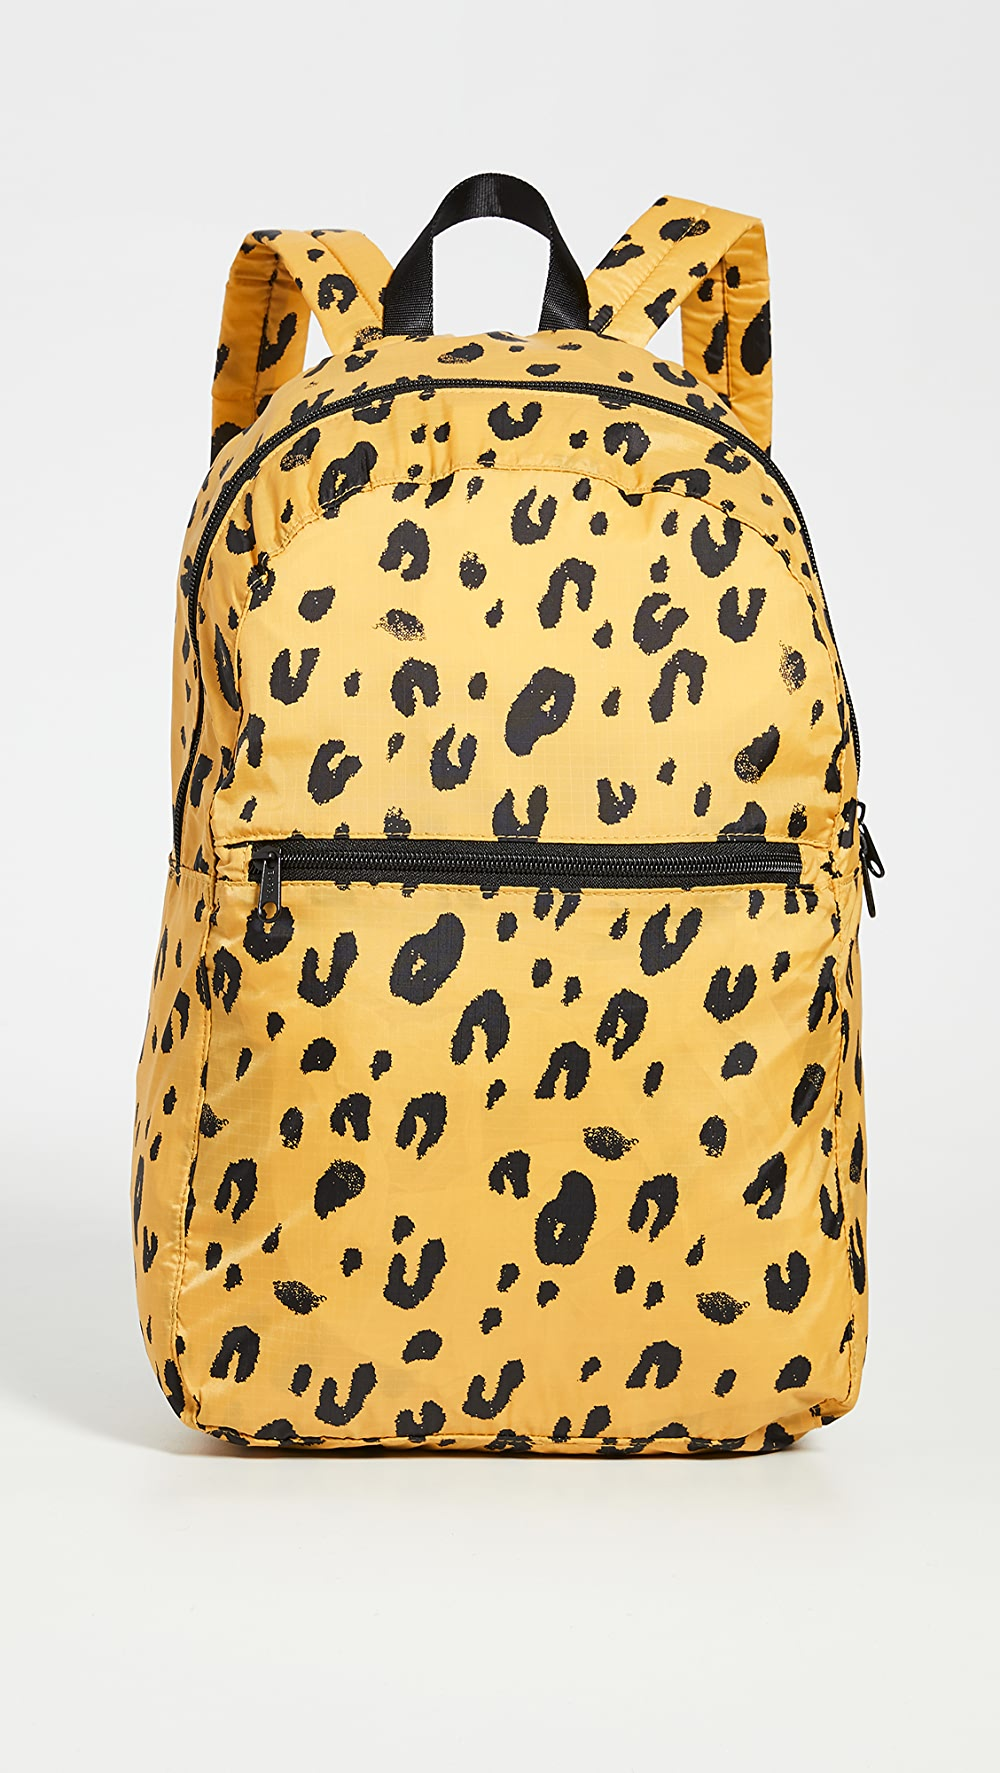 Rapture Baggu - Packable Backpack Price Remains Stable